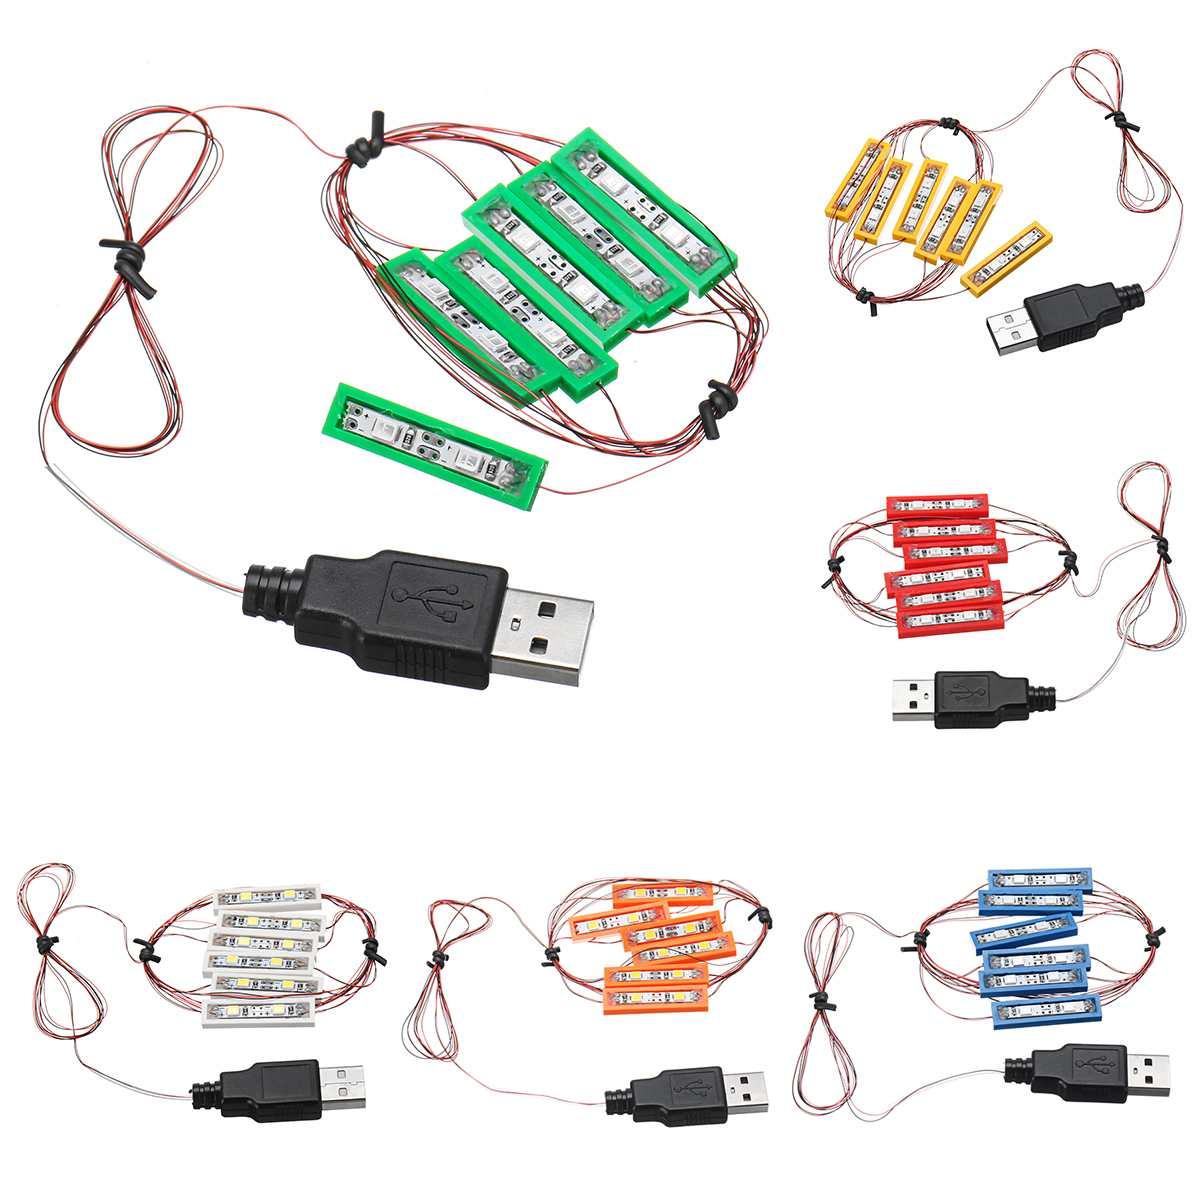 Universal DIY LED Lighting Brick Kit For Lego MOC Toy Bricks Toy With USB Port 6 Color Lighting Kit